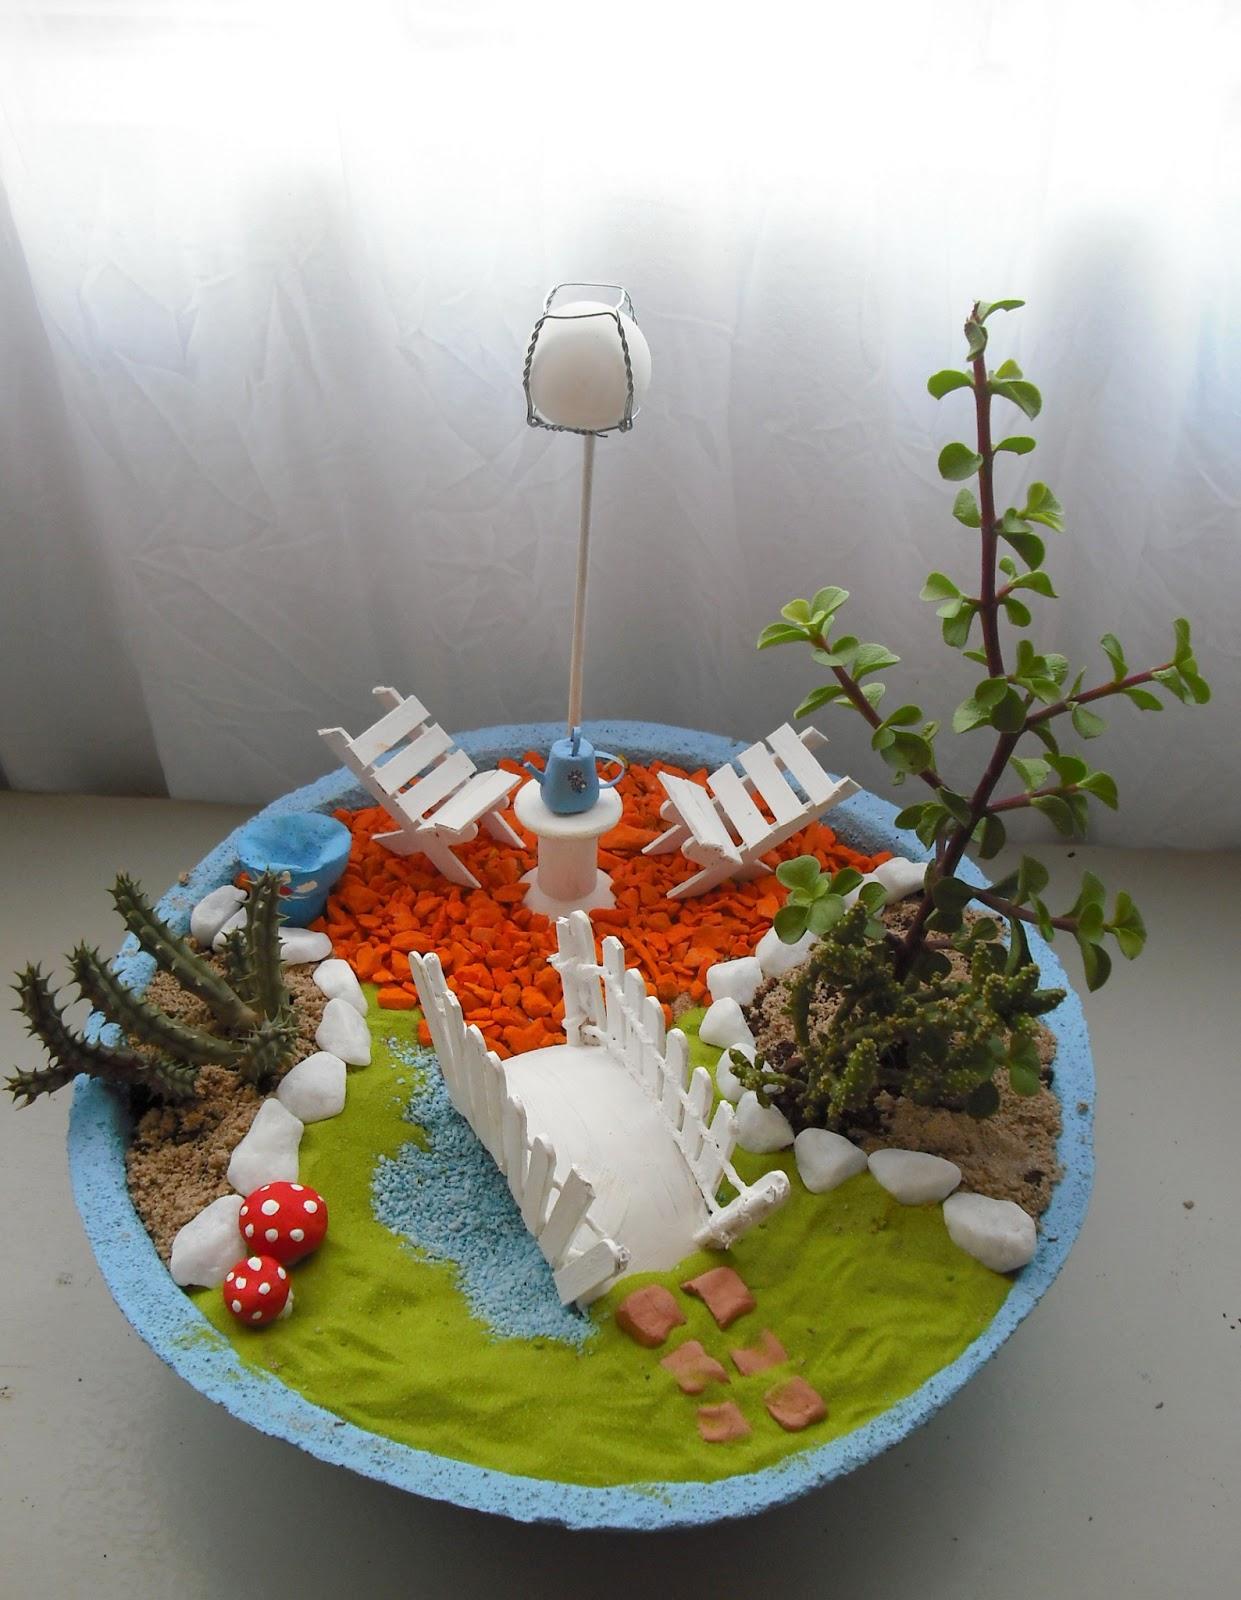 artesanato mini jardim : artesanato mini jardim:CASA'ART: MINI JARDINS